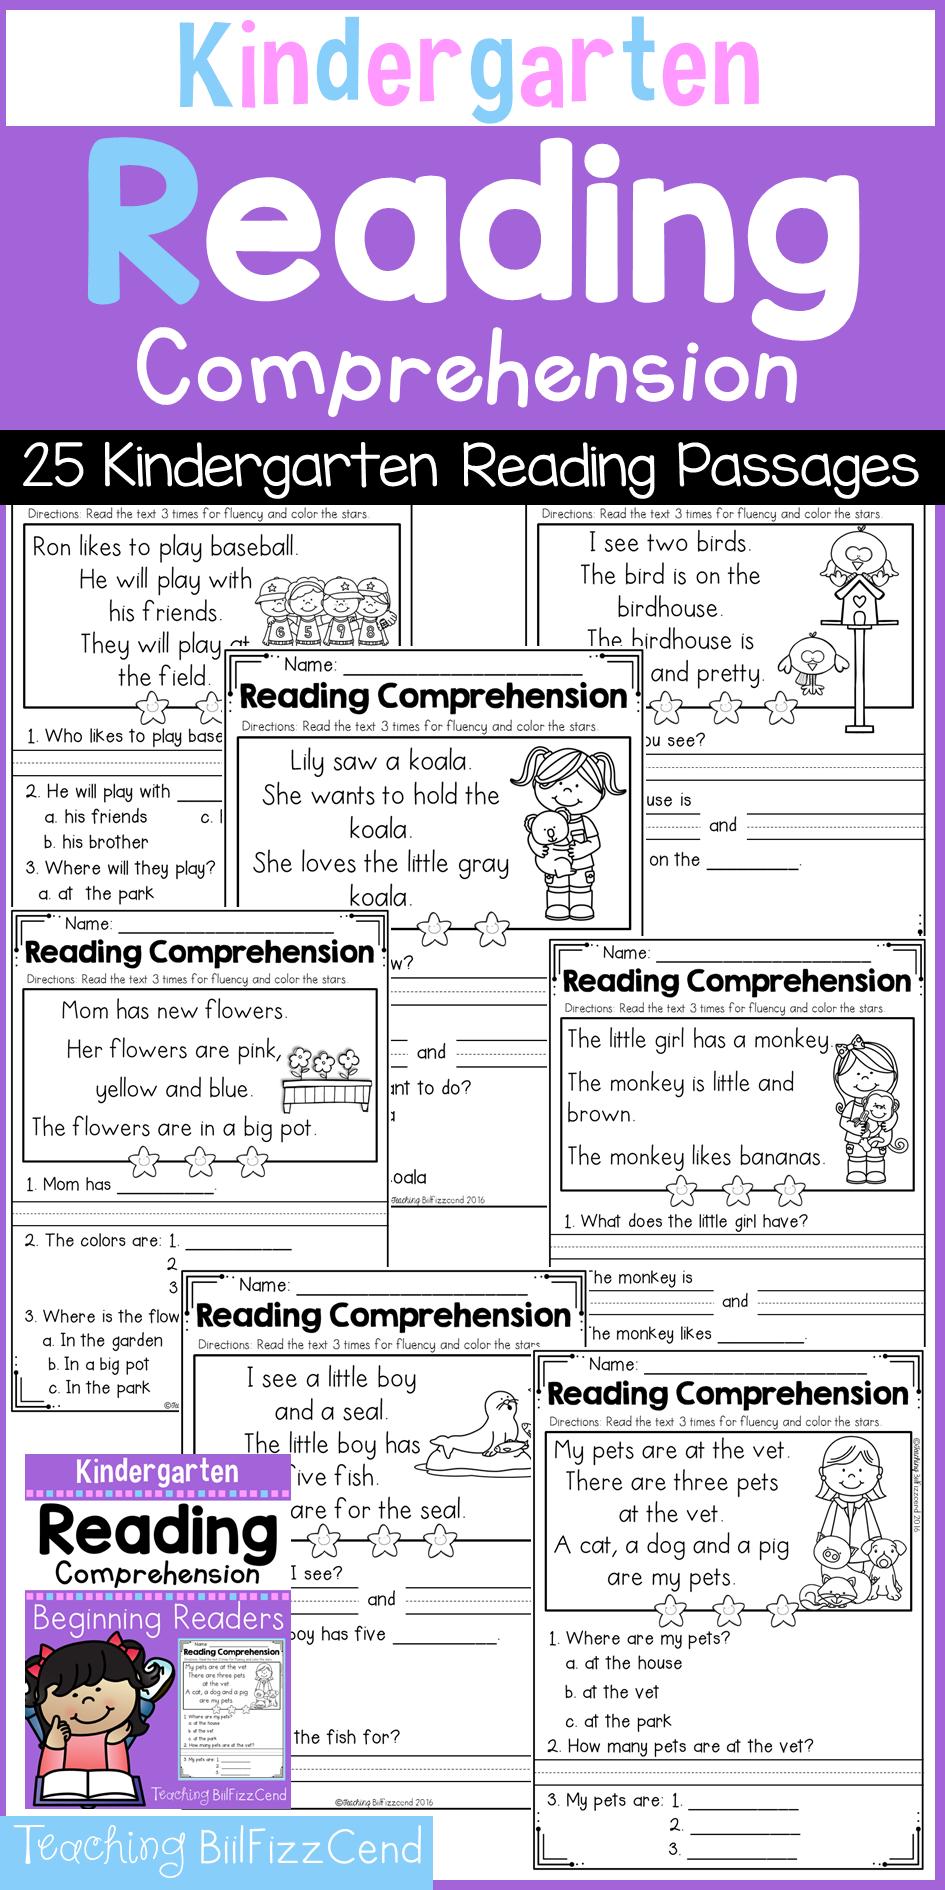 25 Kindergarten Reading Comprehension Passages And Fluency Reading Comprehension Kindergarten Reading Comprehension Kindergarten Comprehension [ 1890 x 945 Pixel ]